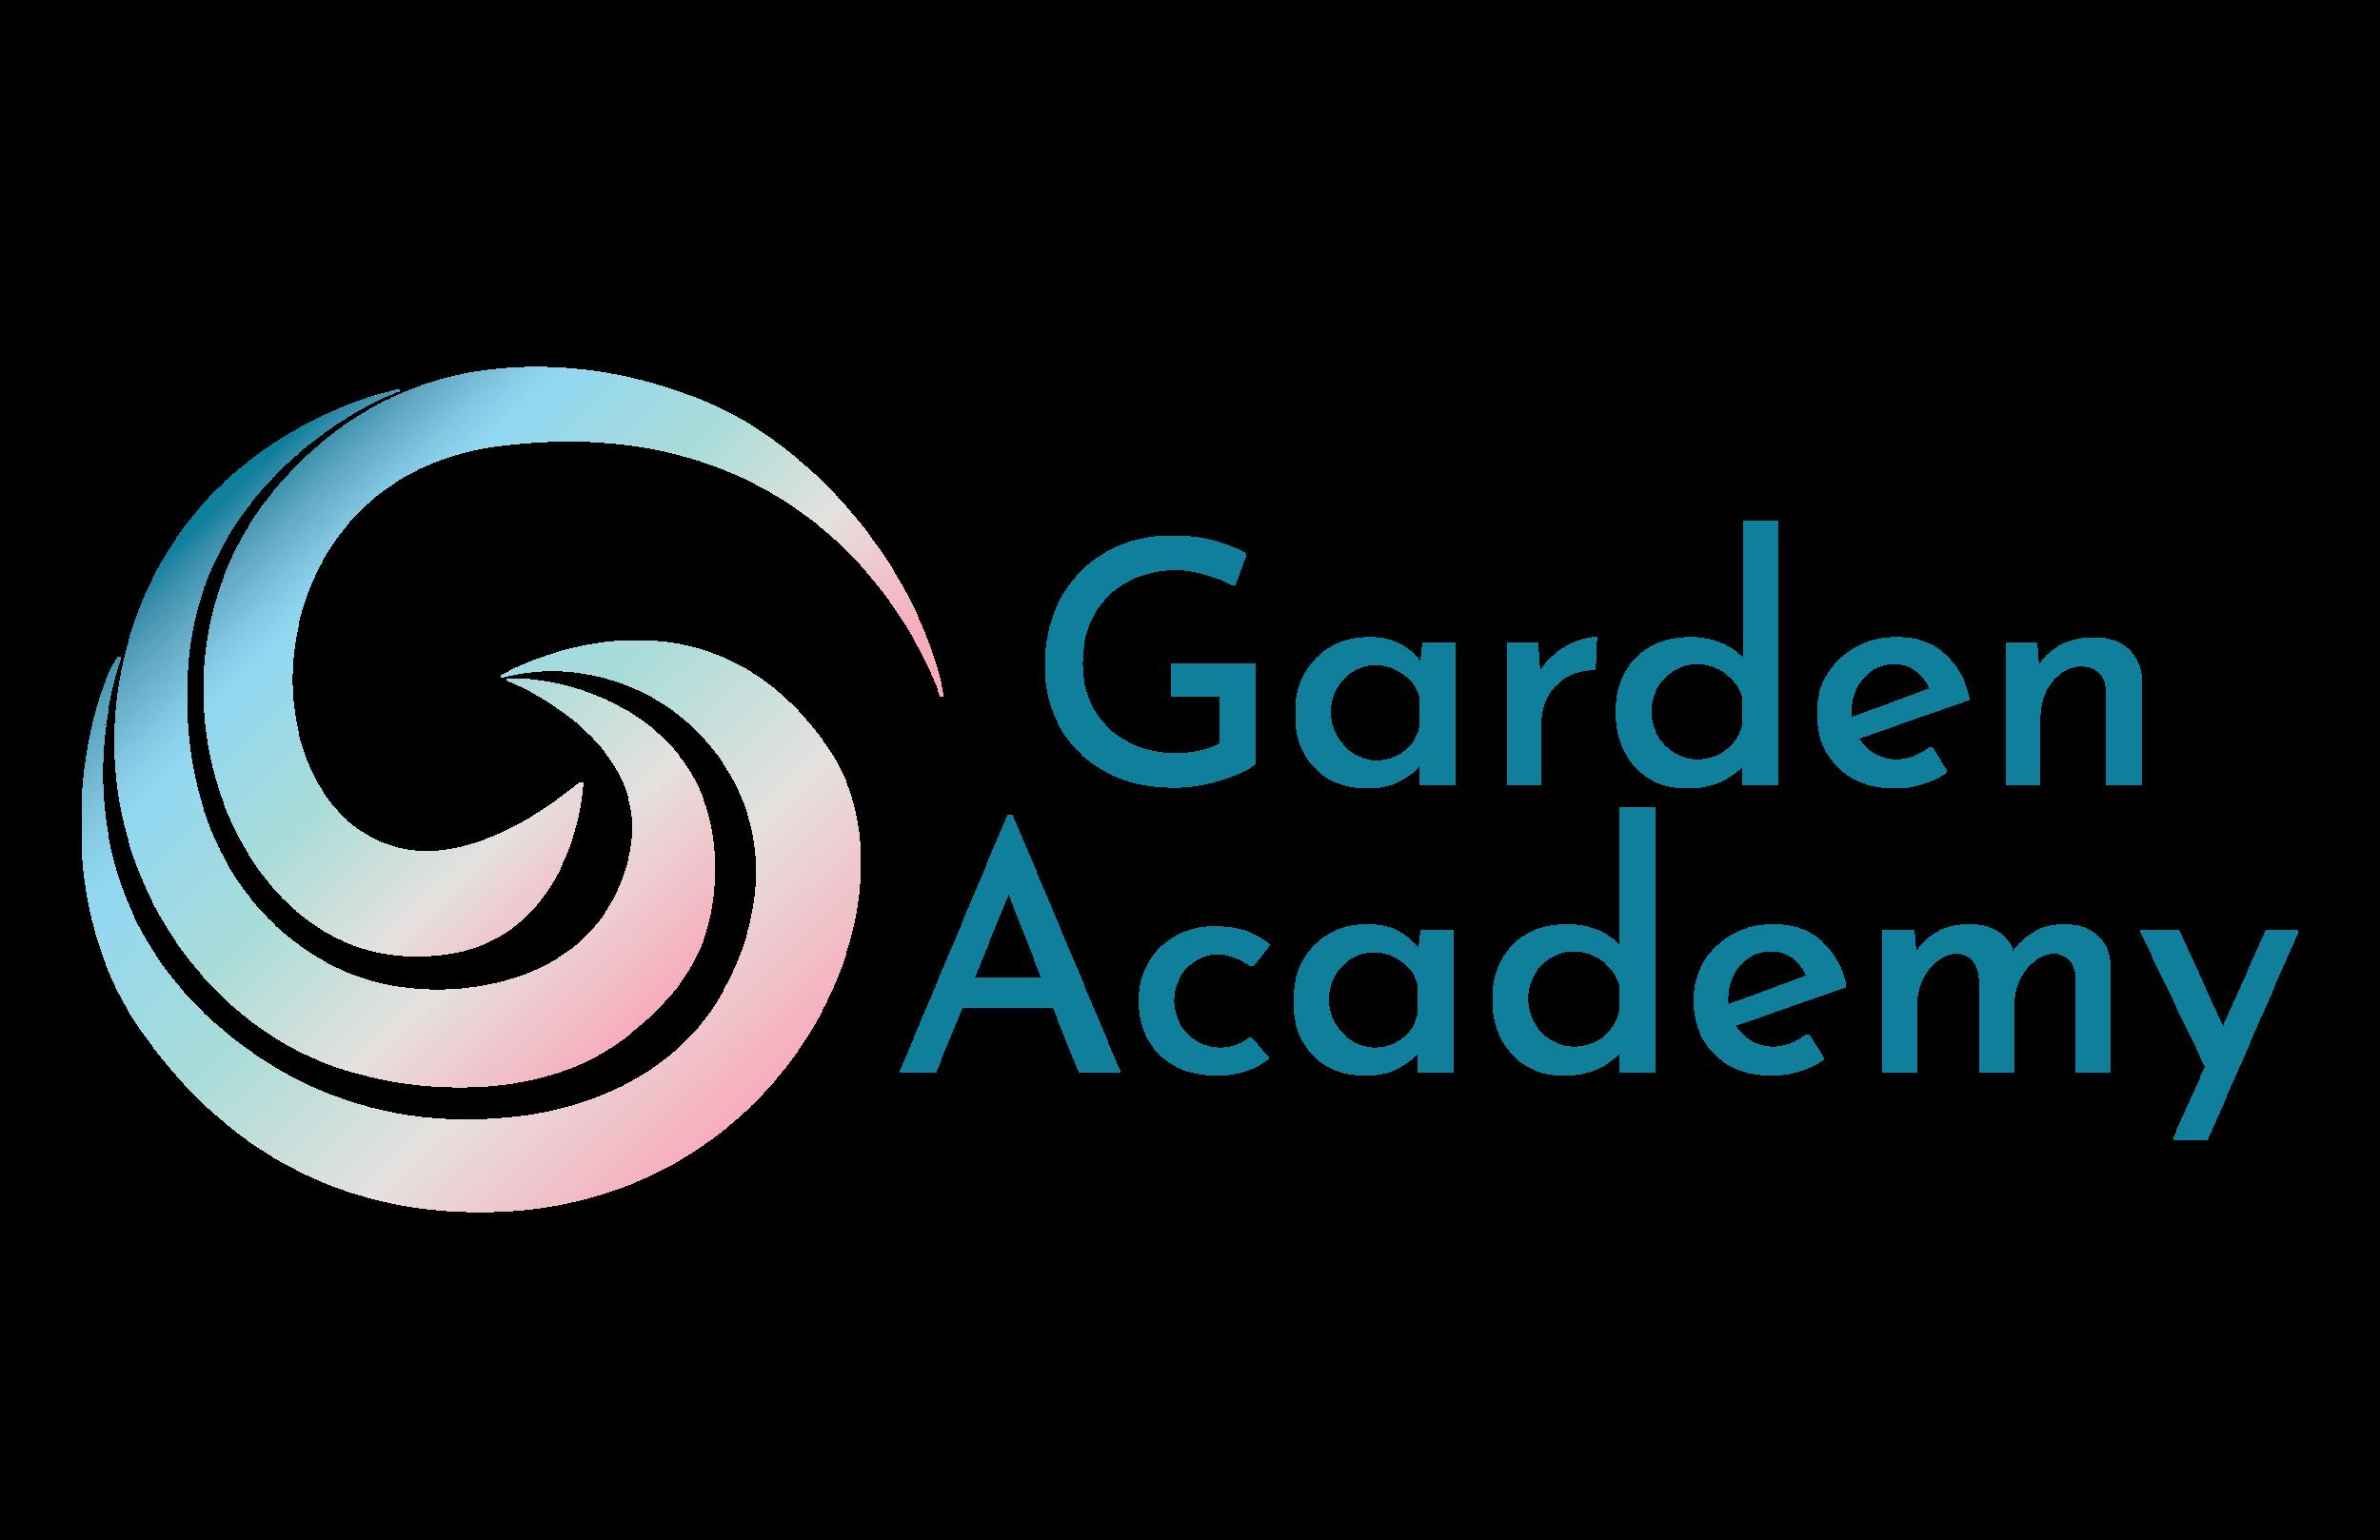 Garden Academy Horizontal.png